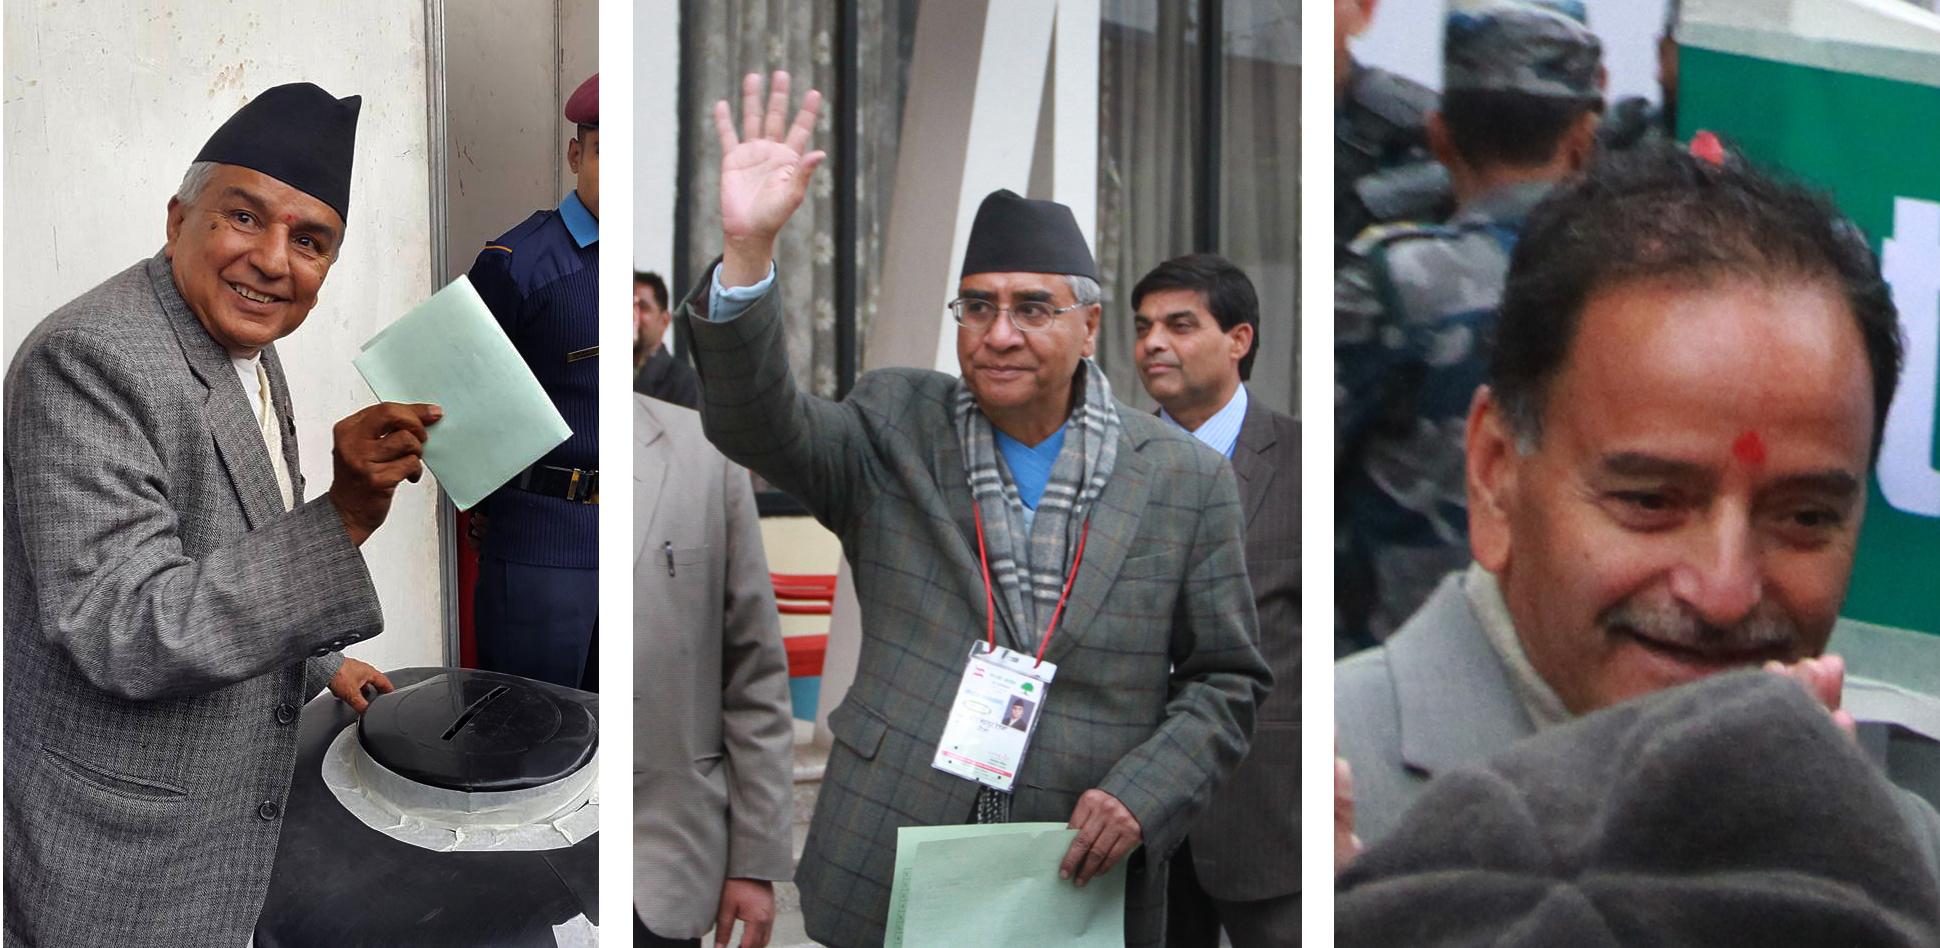 Nepali Congress Acting President Ramchandra Paudel, senior leader Sher Bahadur Deuba and General Secretary Krishna Prasad Sitaula casting their votes to elect CWC members during the 13th General Convention at the City Hall, Bhrikutimandap, Kathmandu, on Sunday, March 6, 2016. Photo: THT